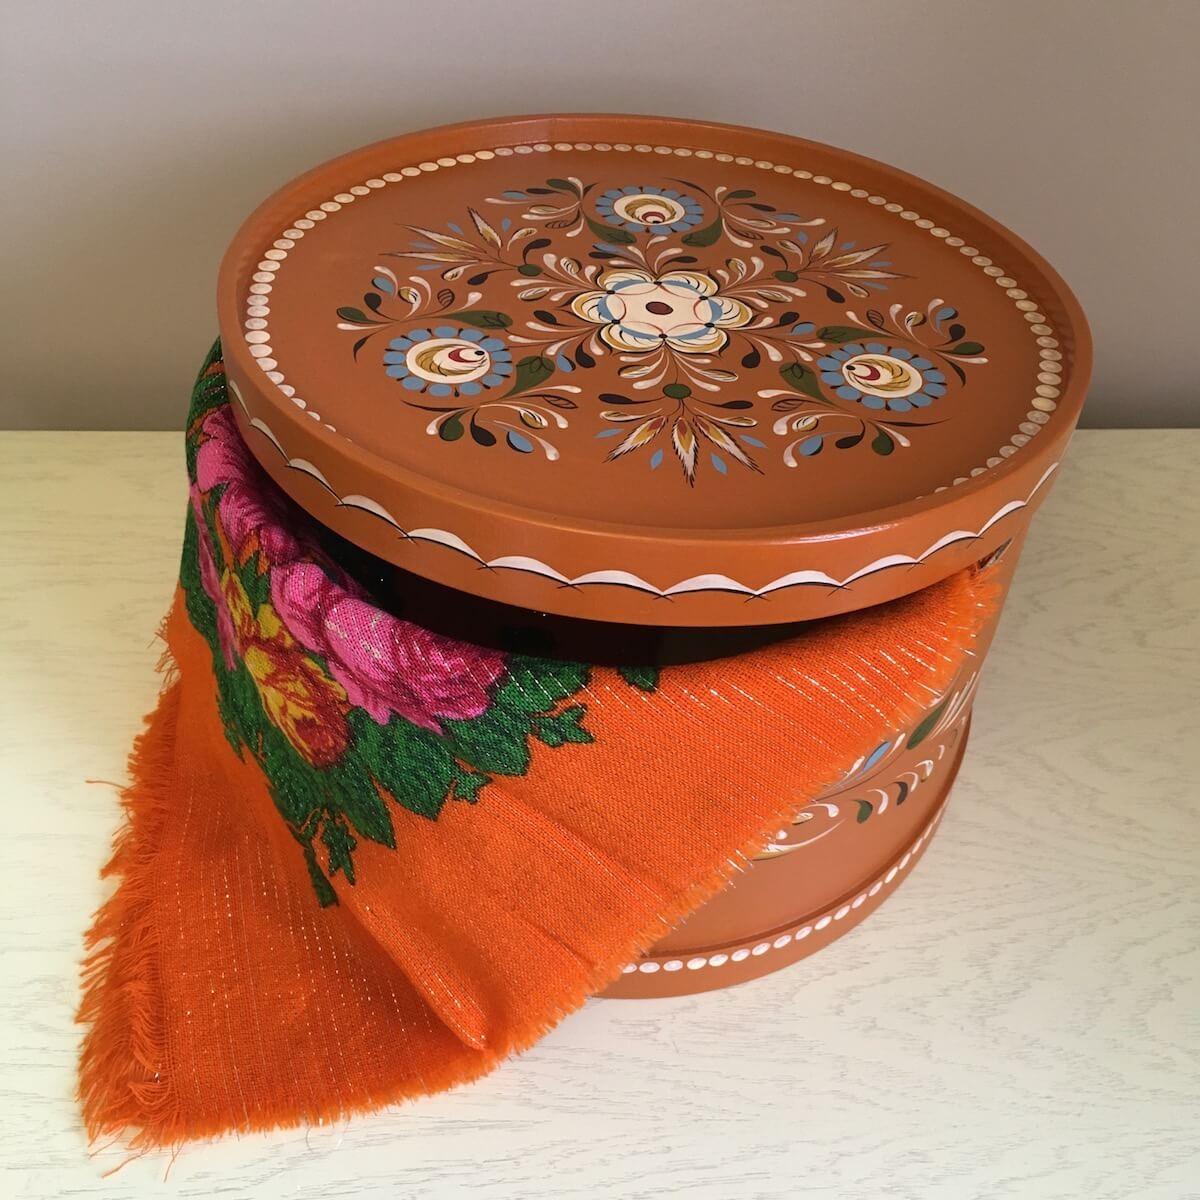 необычный подарок маме или бабушке – короб, шкатулка для хранения